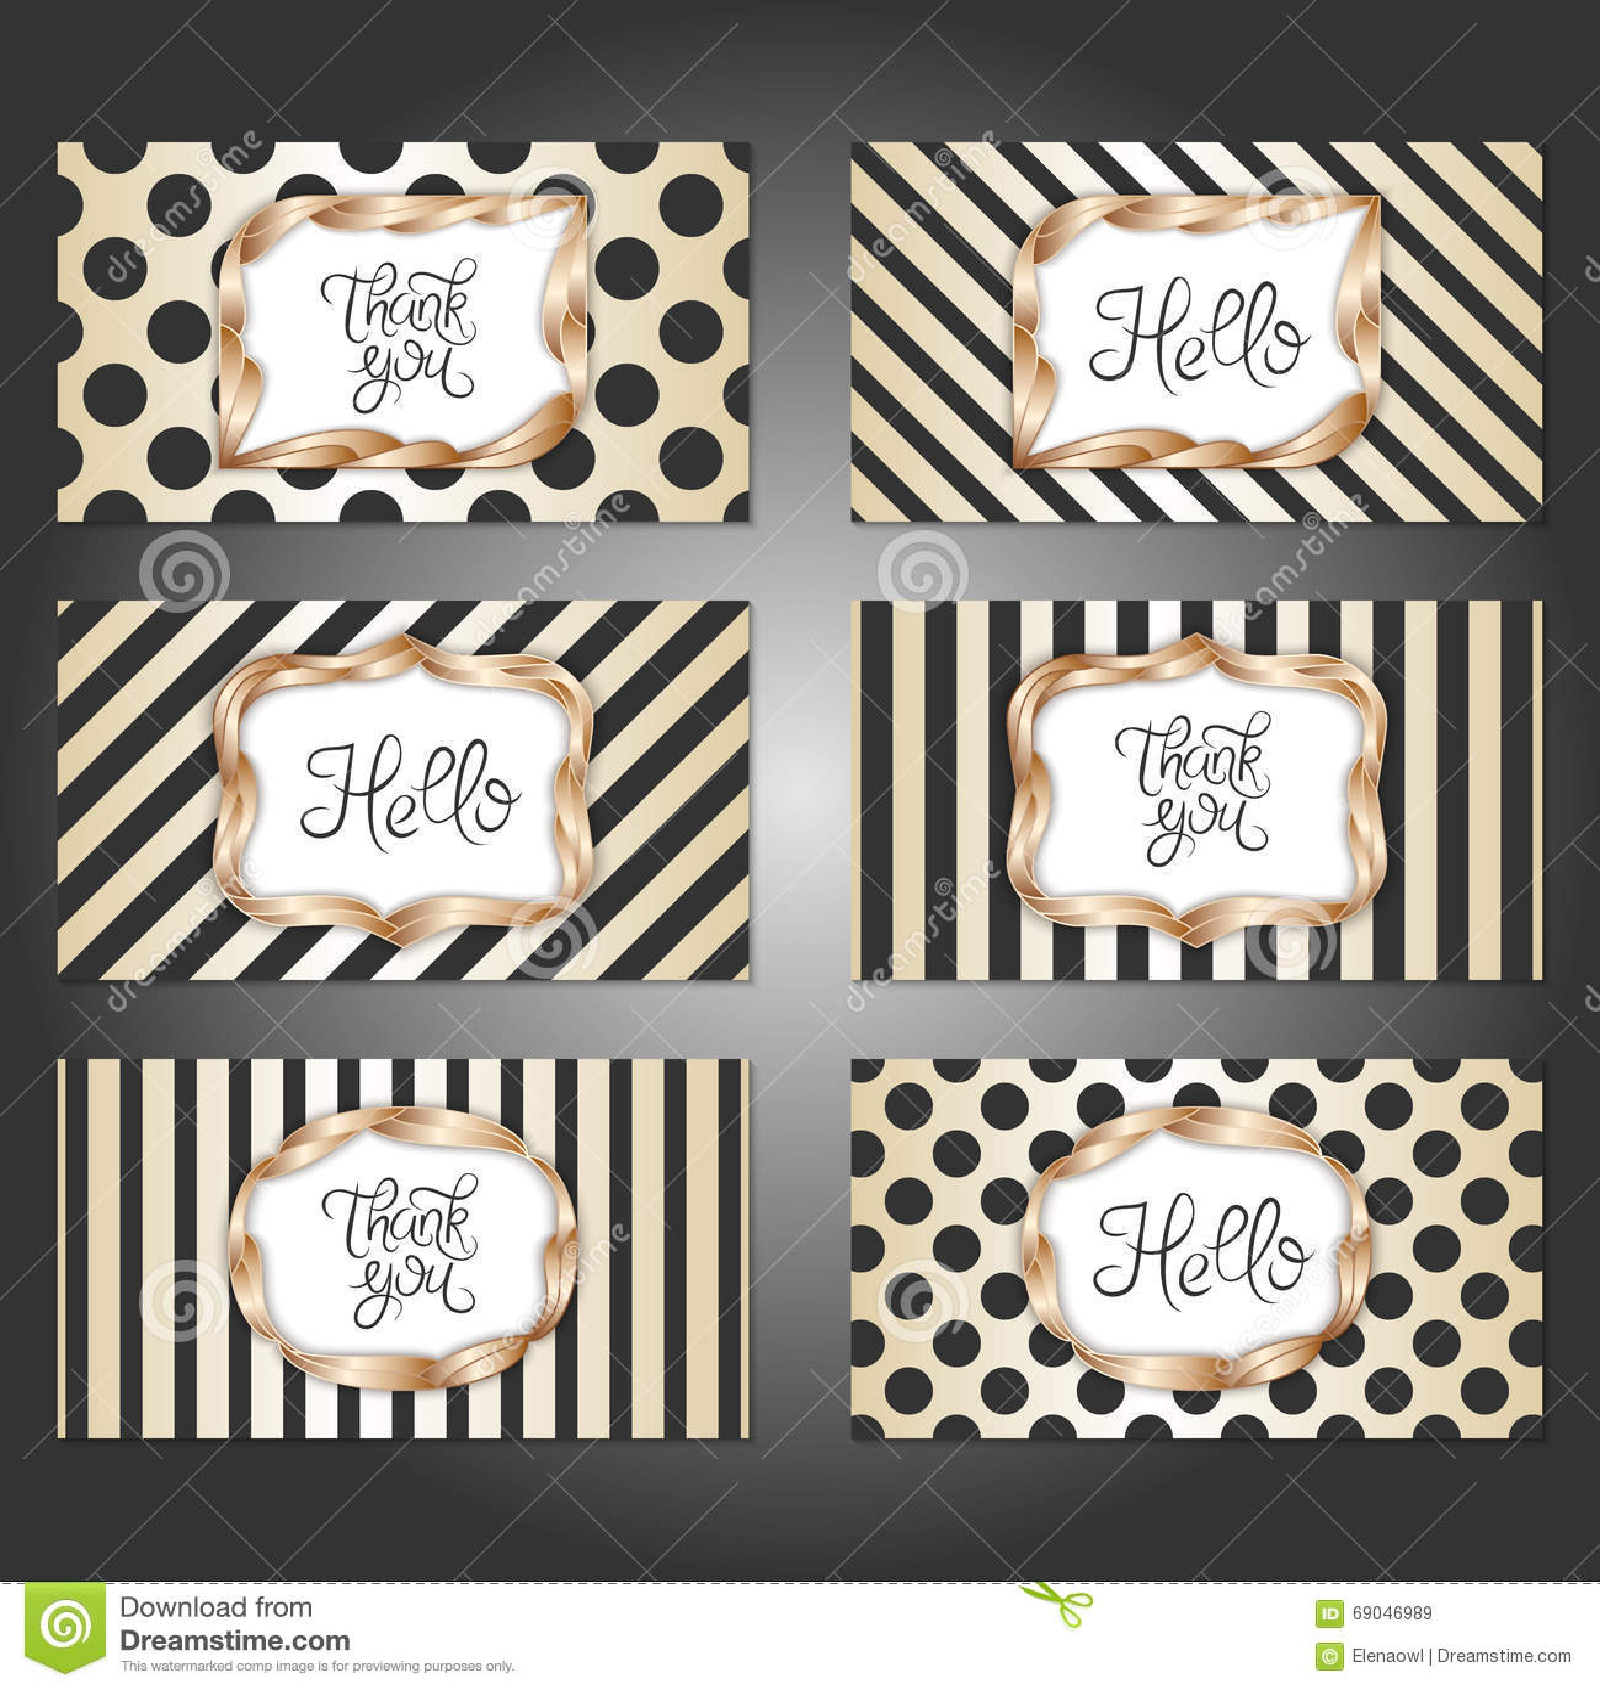 Set Of 6 Vintage Card Templates In Gold, Black And White. Country Chic Living Room. Farmhouse Door. Bathroom Vanity Light Fixture. Scissor Truss. Mosaic Bathroom Floor Tile. Kitchen. Fireplace Mantle. Bona Traffic